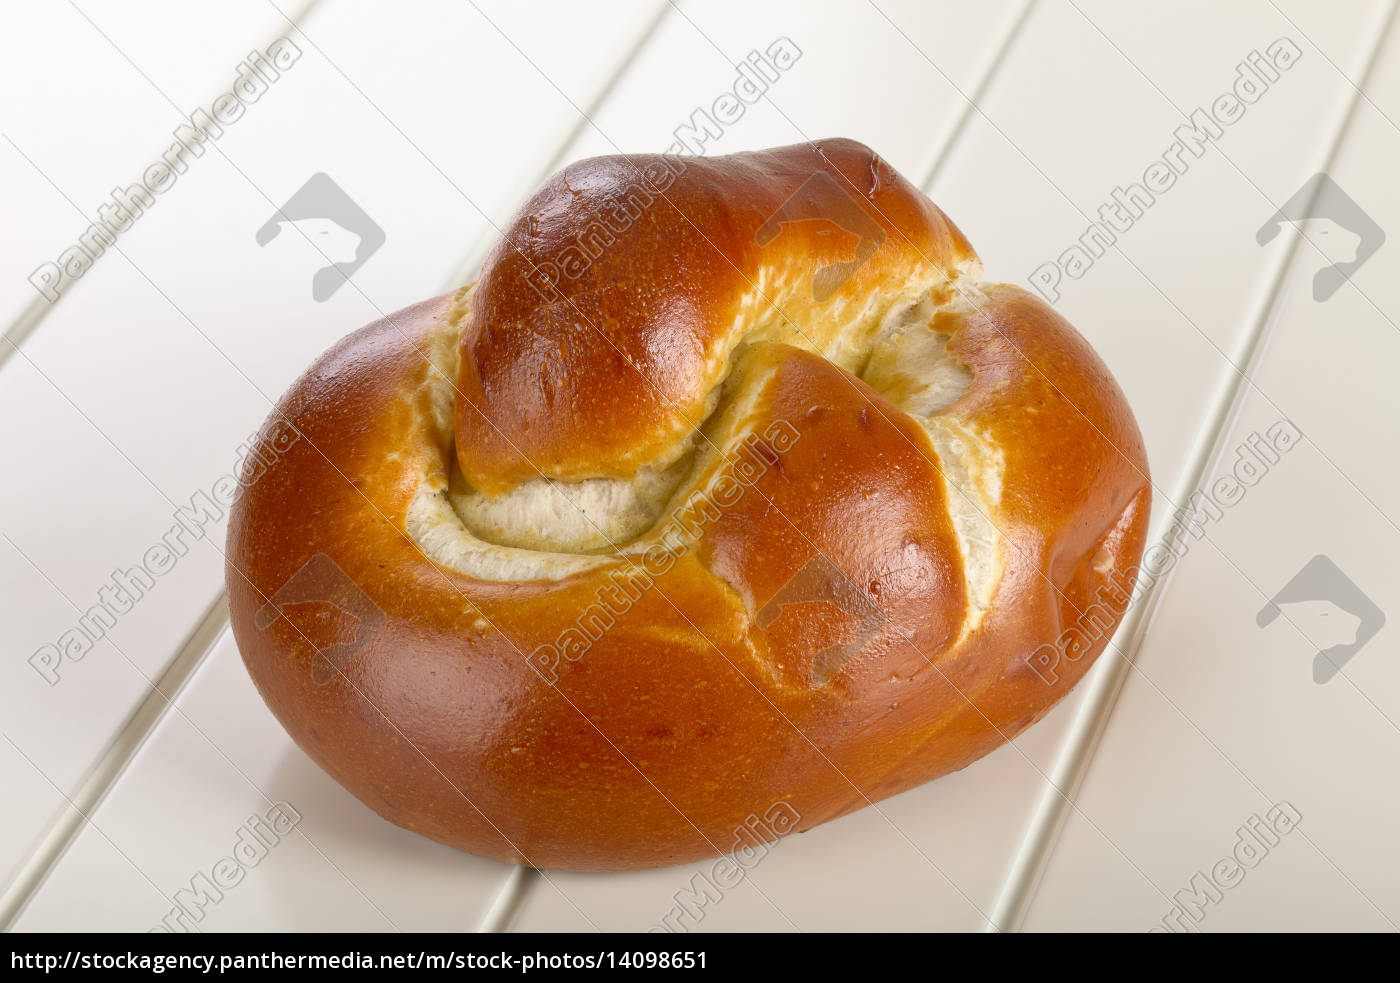 bread, roll - 14098651